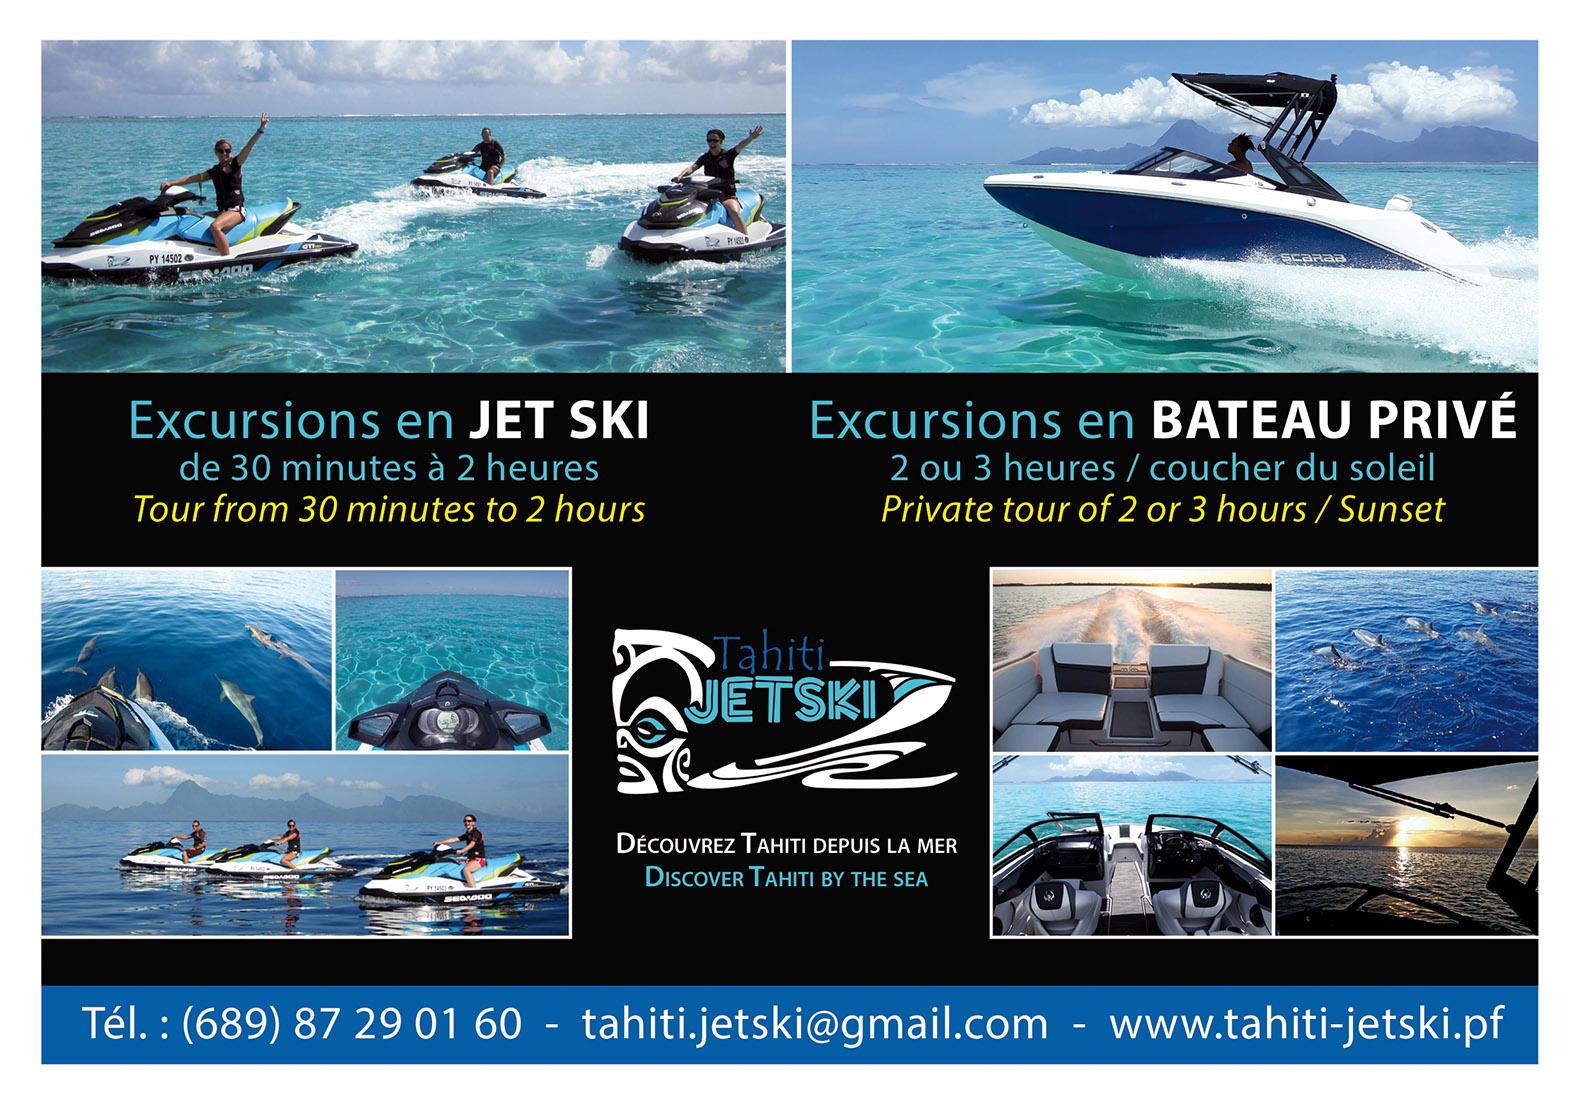 https://tahititourisme.es/wp-content/uploads/2017/08/Tahiti-Jet-Ski-190x130-sept-2.jpg